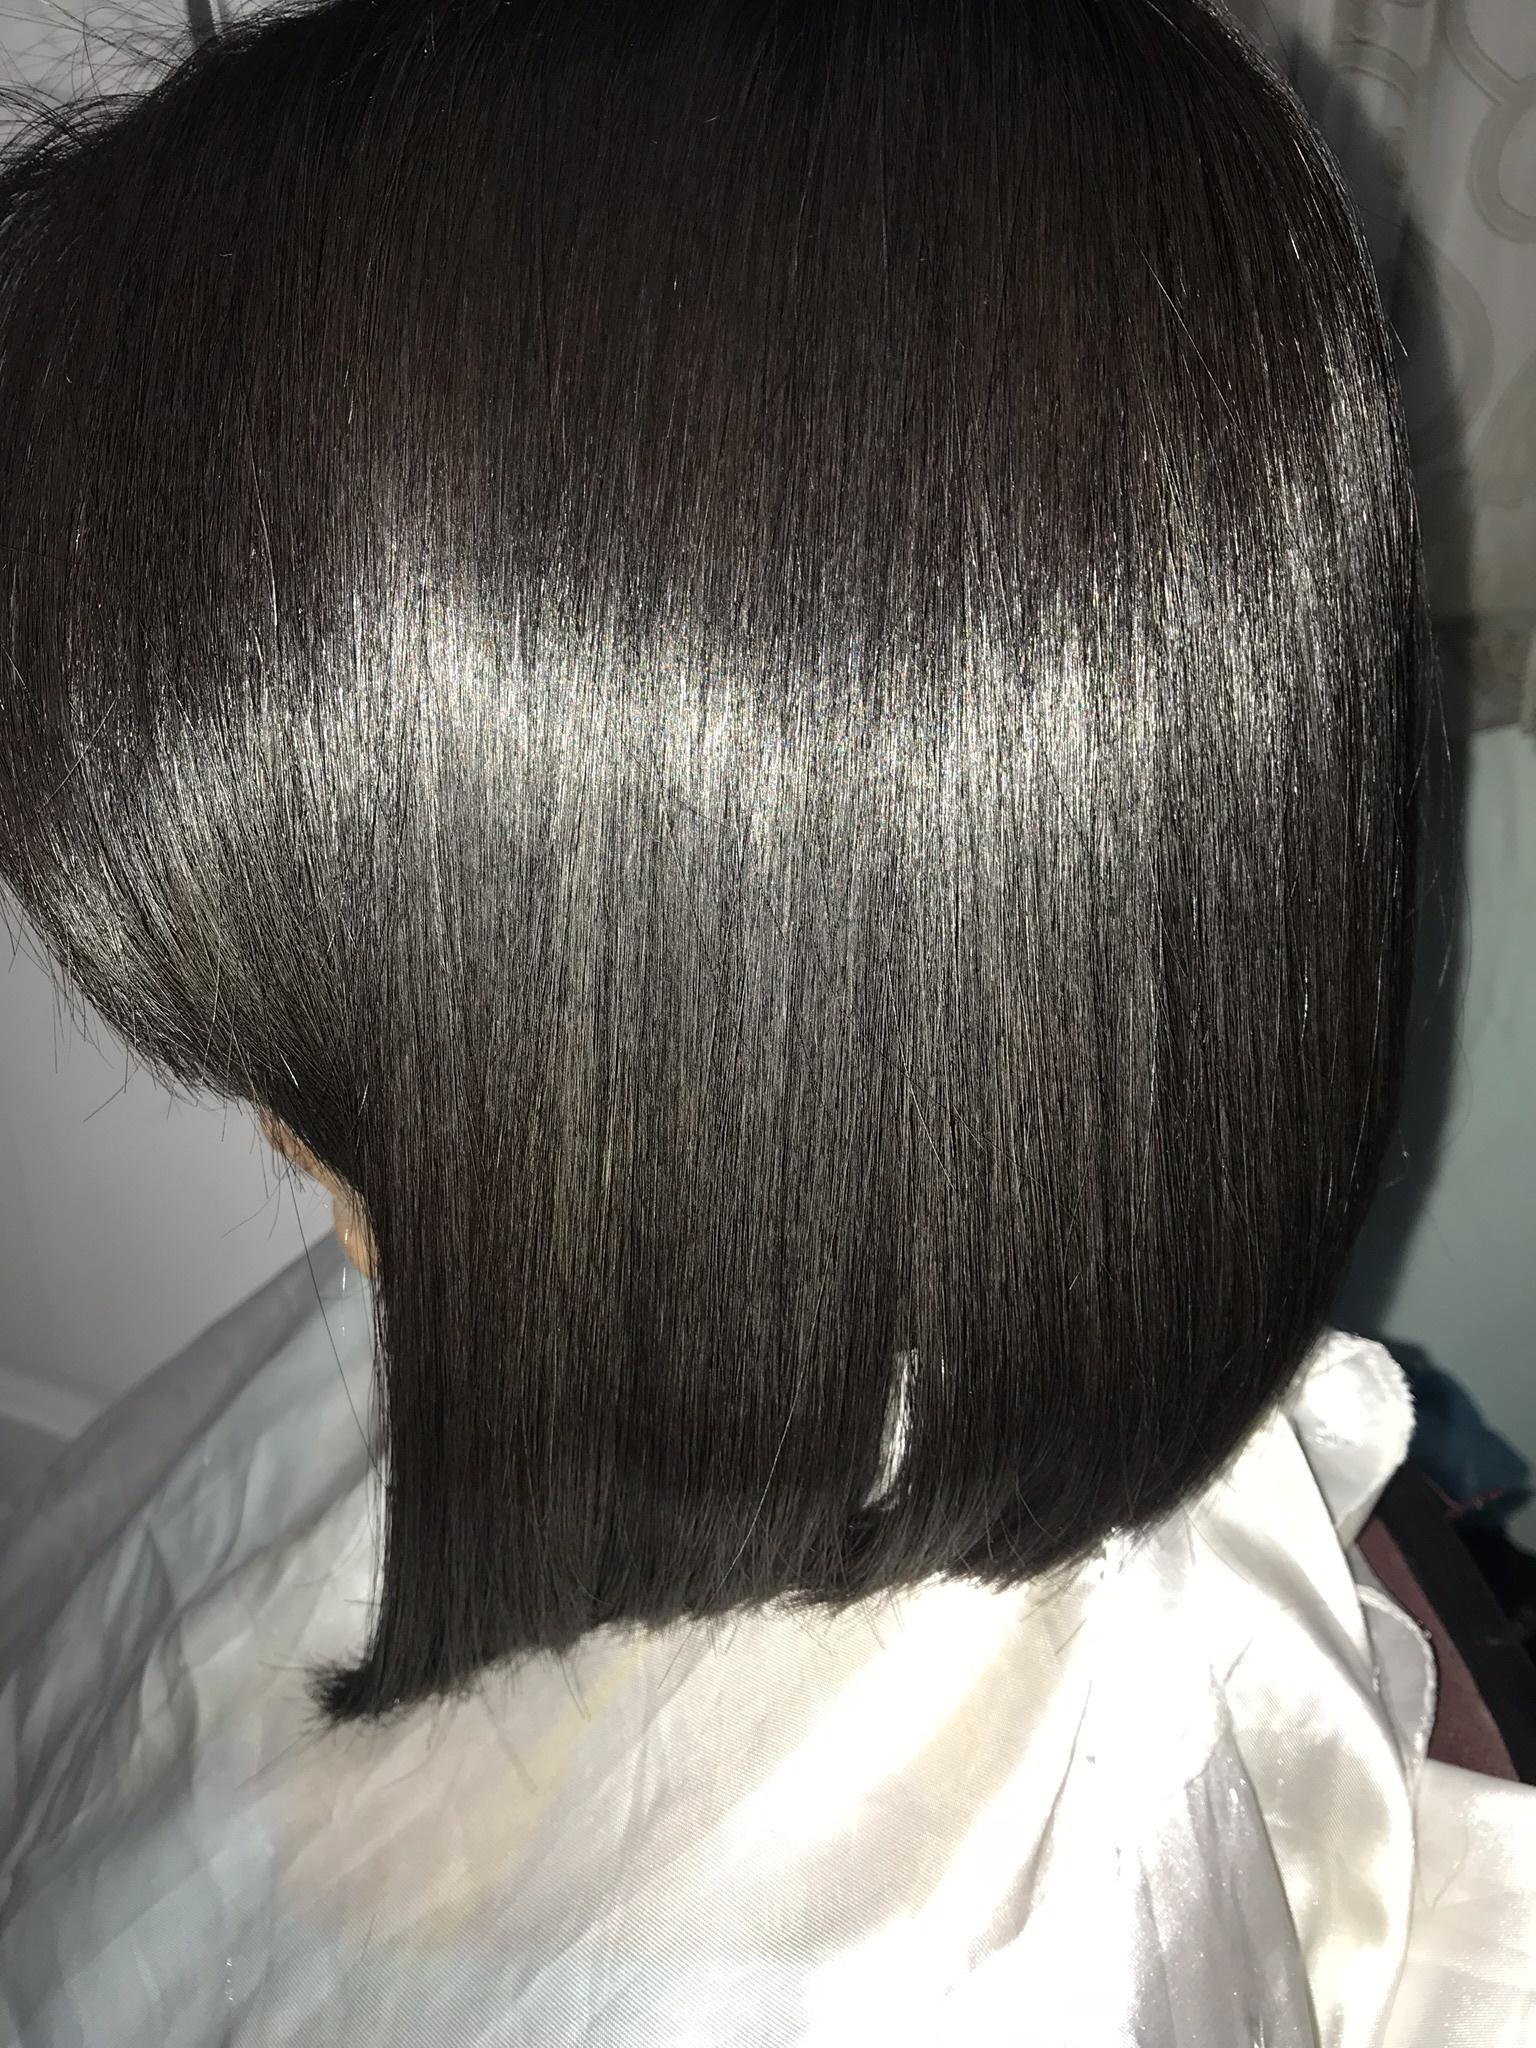 Corte + técnica de alistamento cabelo estudante (cabeleireiro)